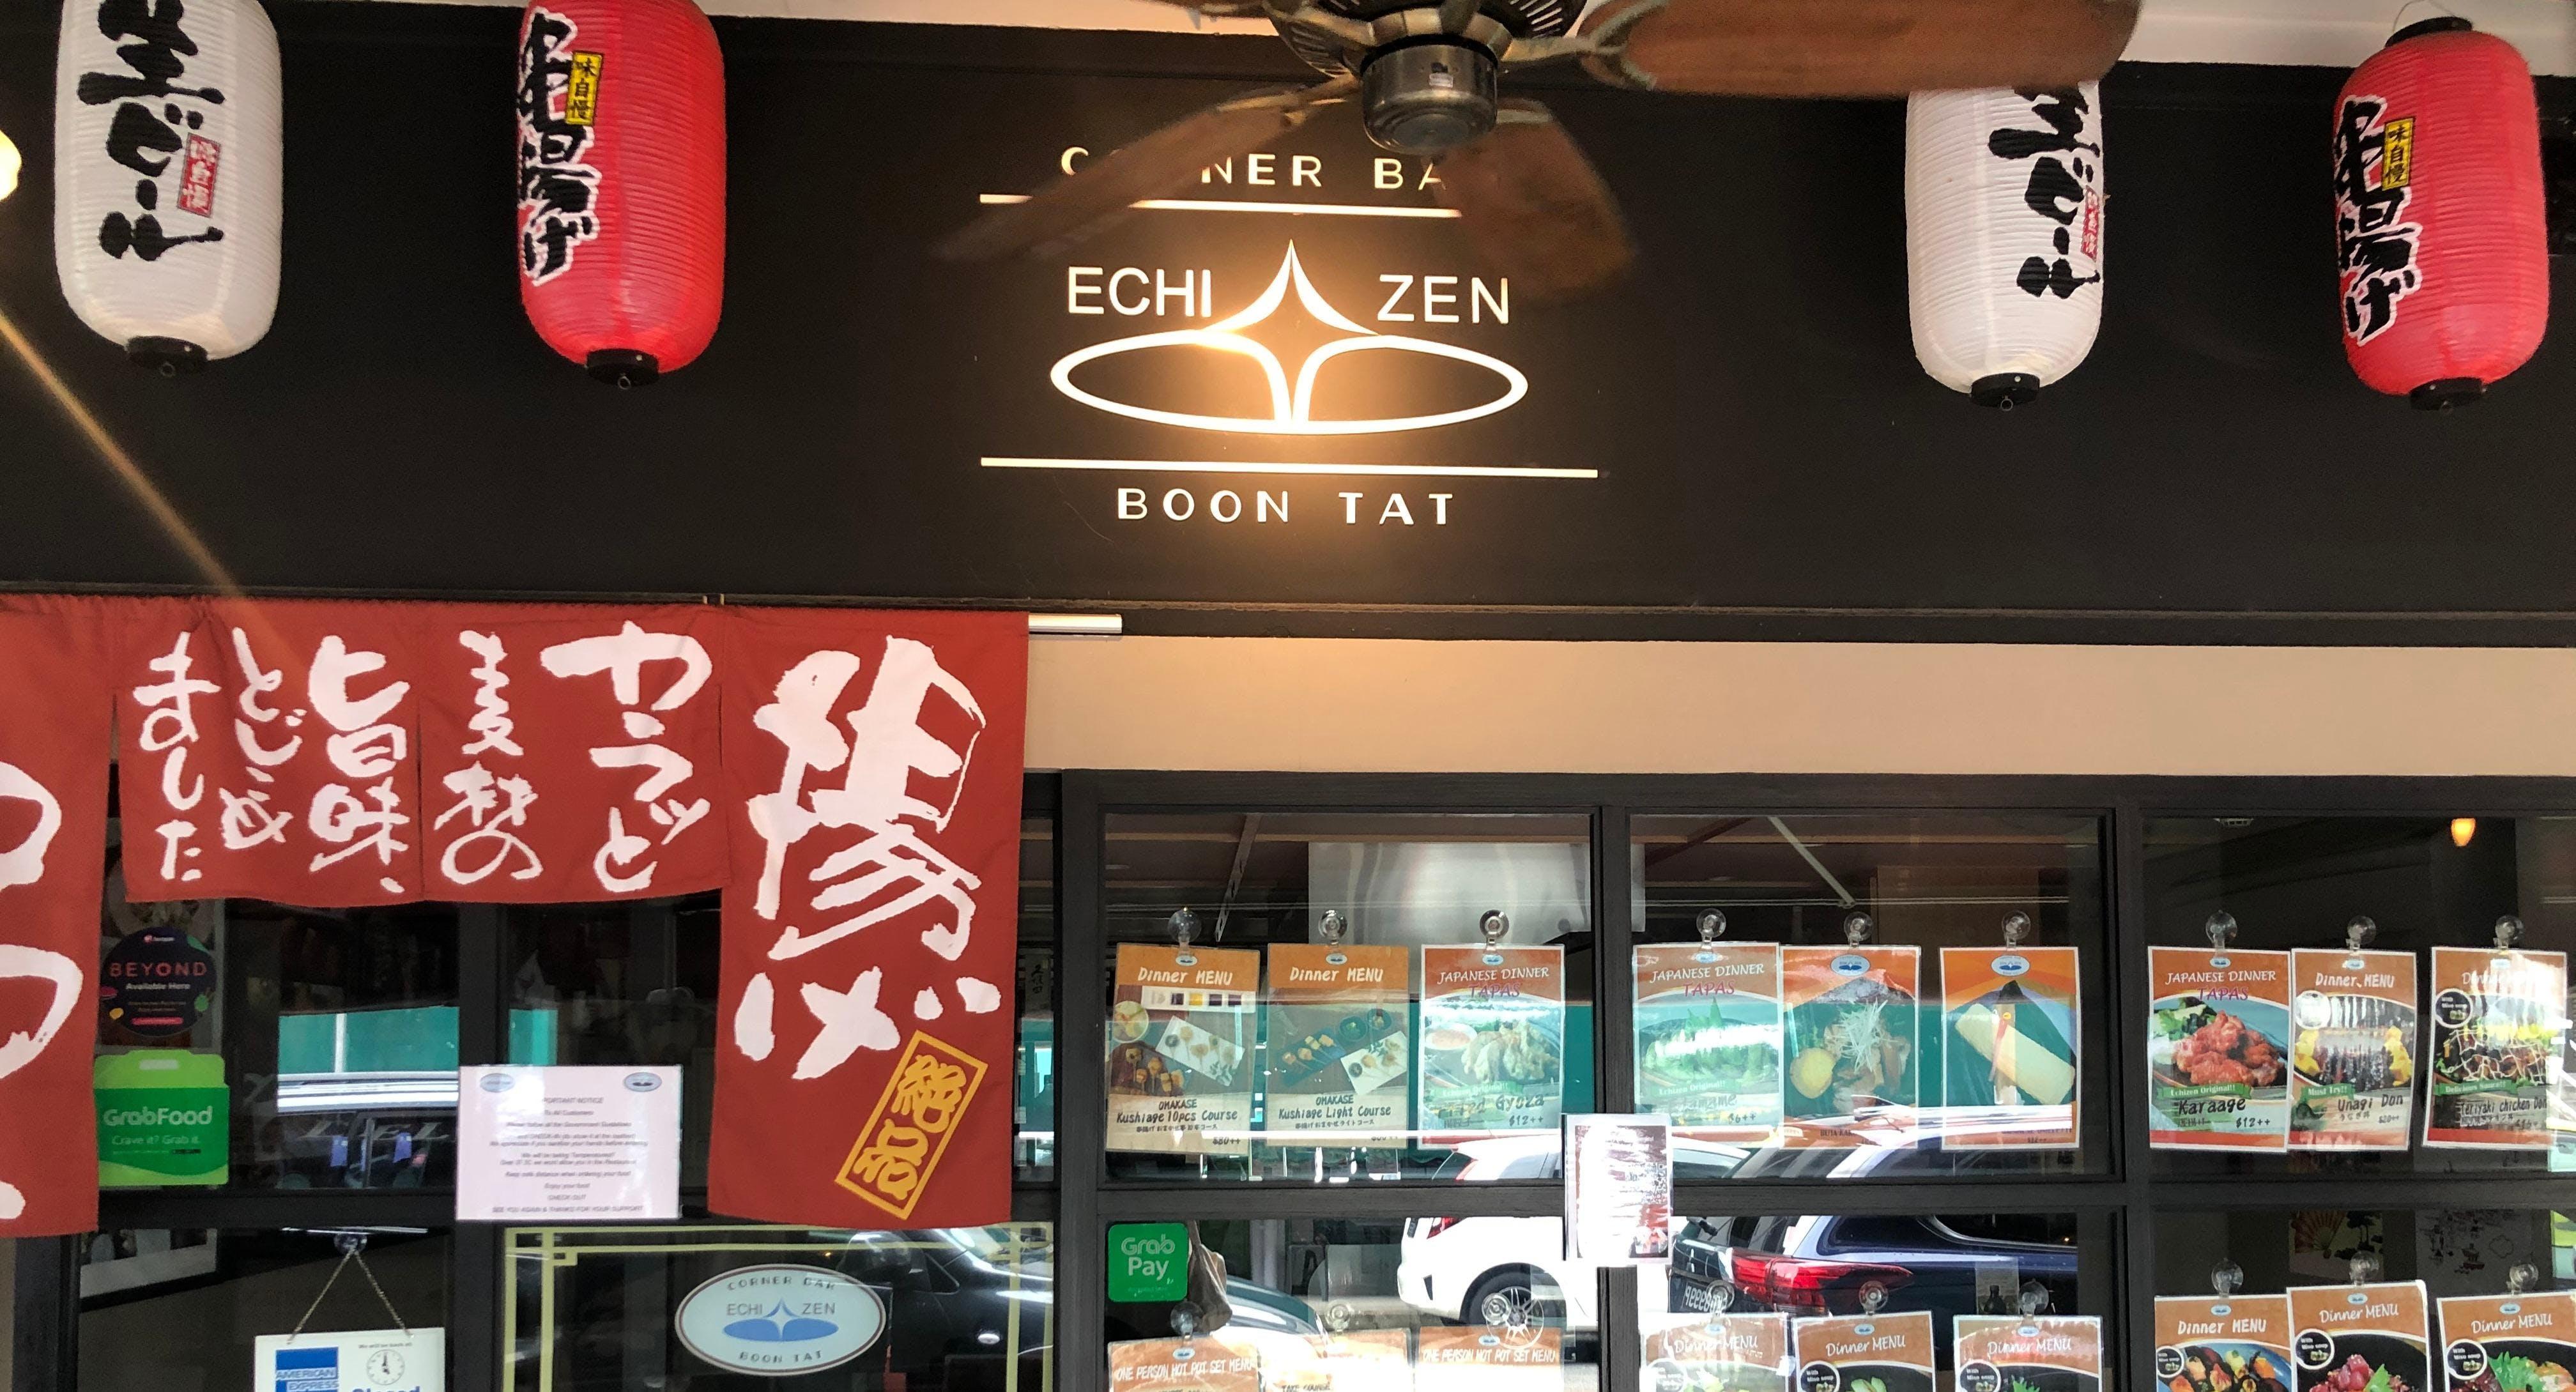 Photo of restaurant Echizen Corner Bar in Telok Ayer, Singapore